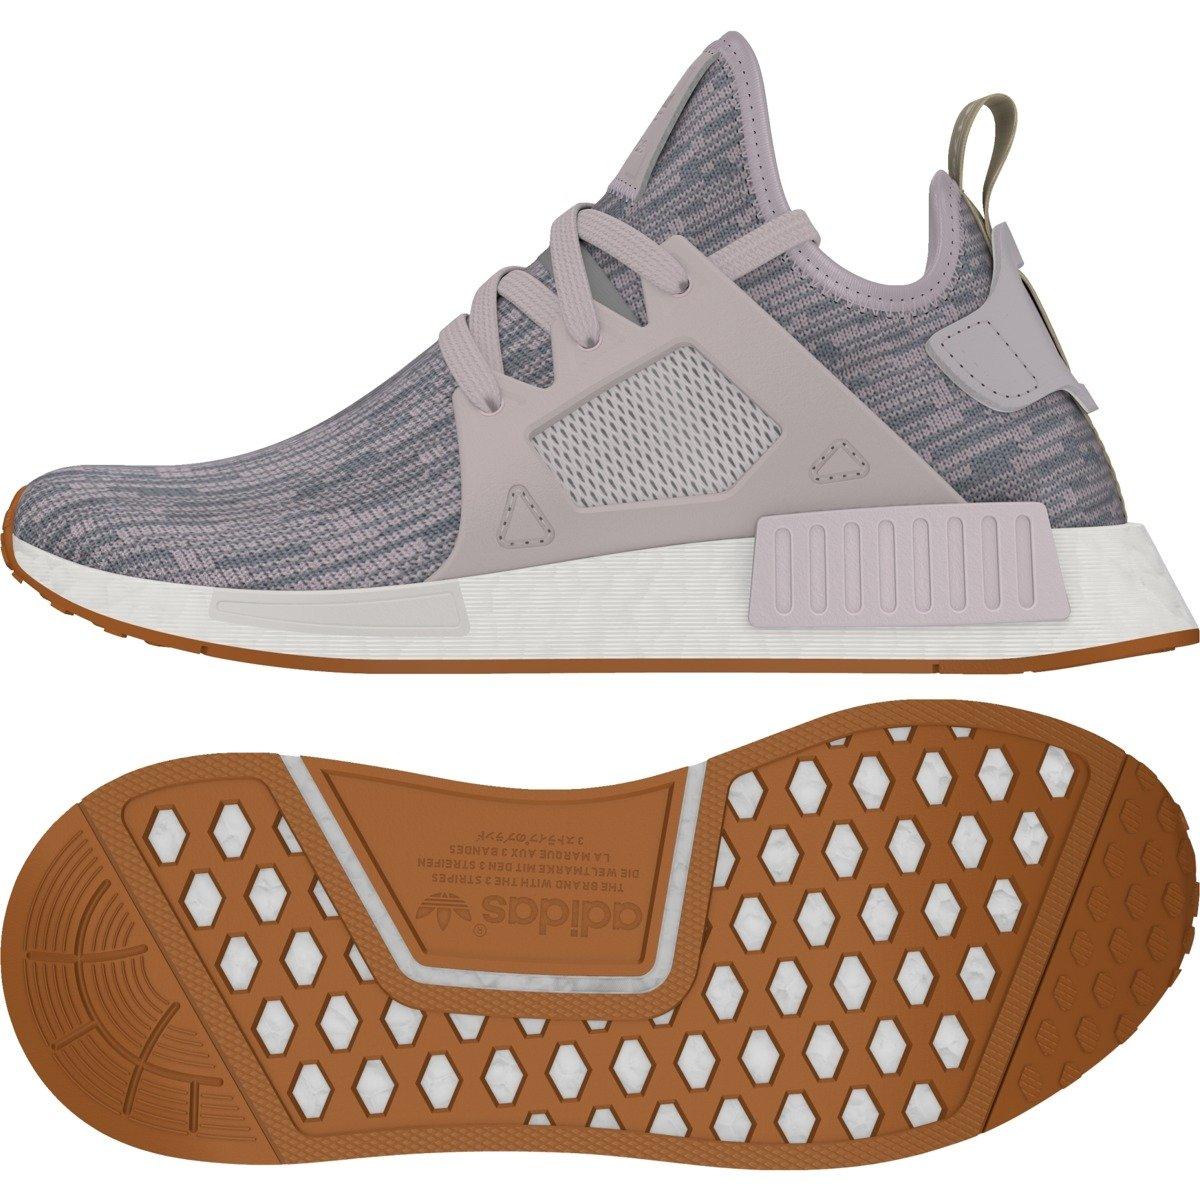 adidas shoes xr1